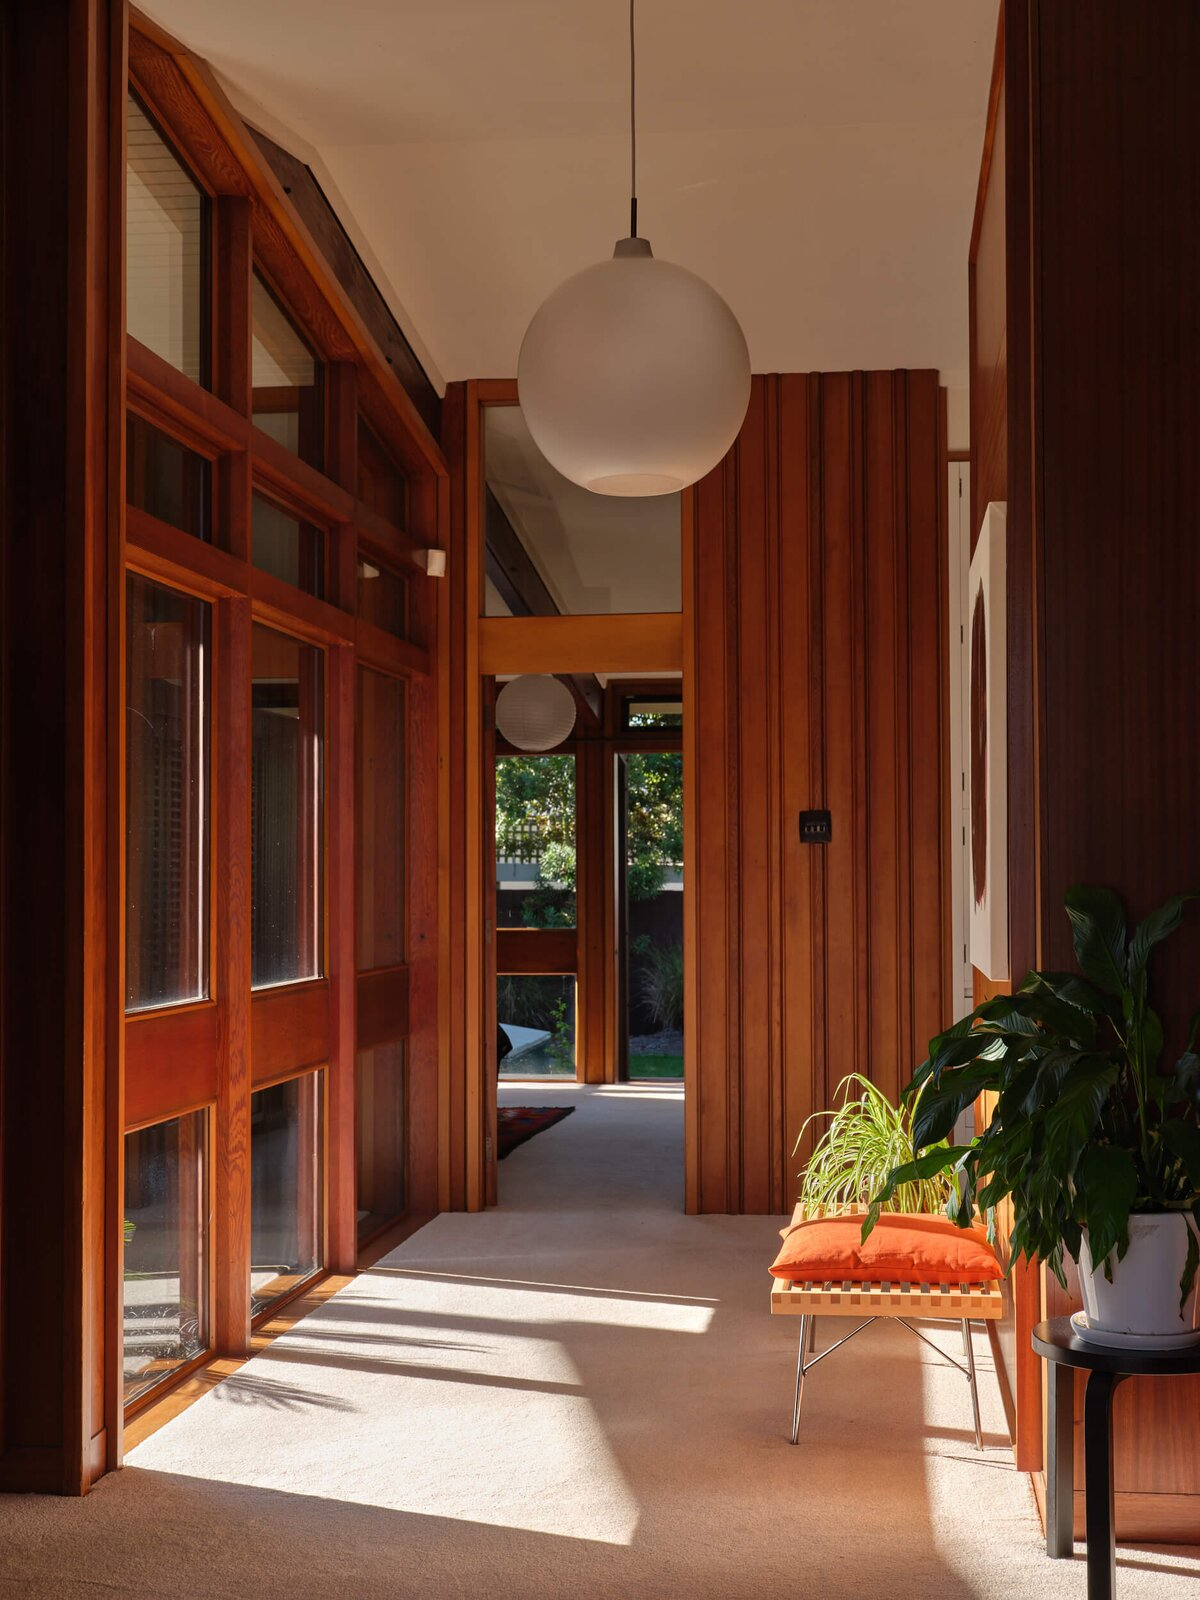 The Fletcher House hallway